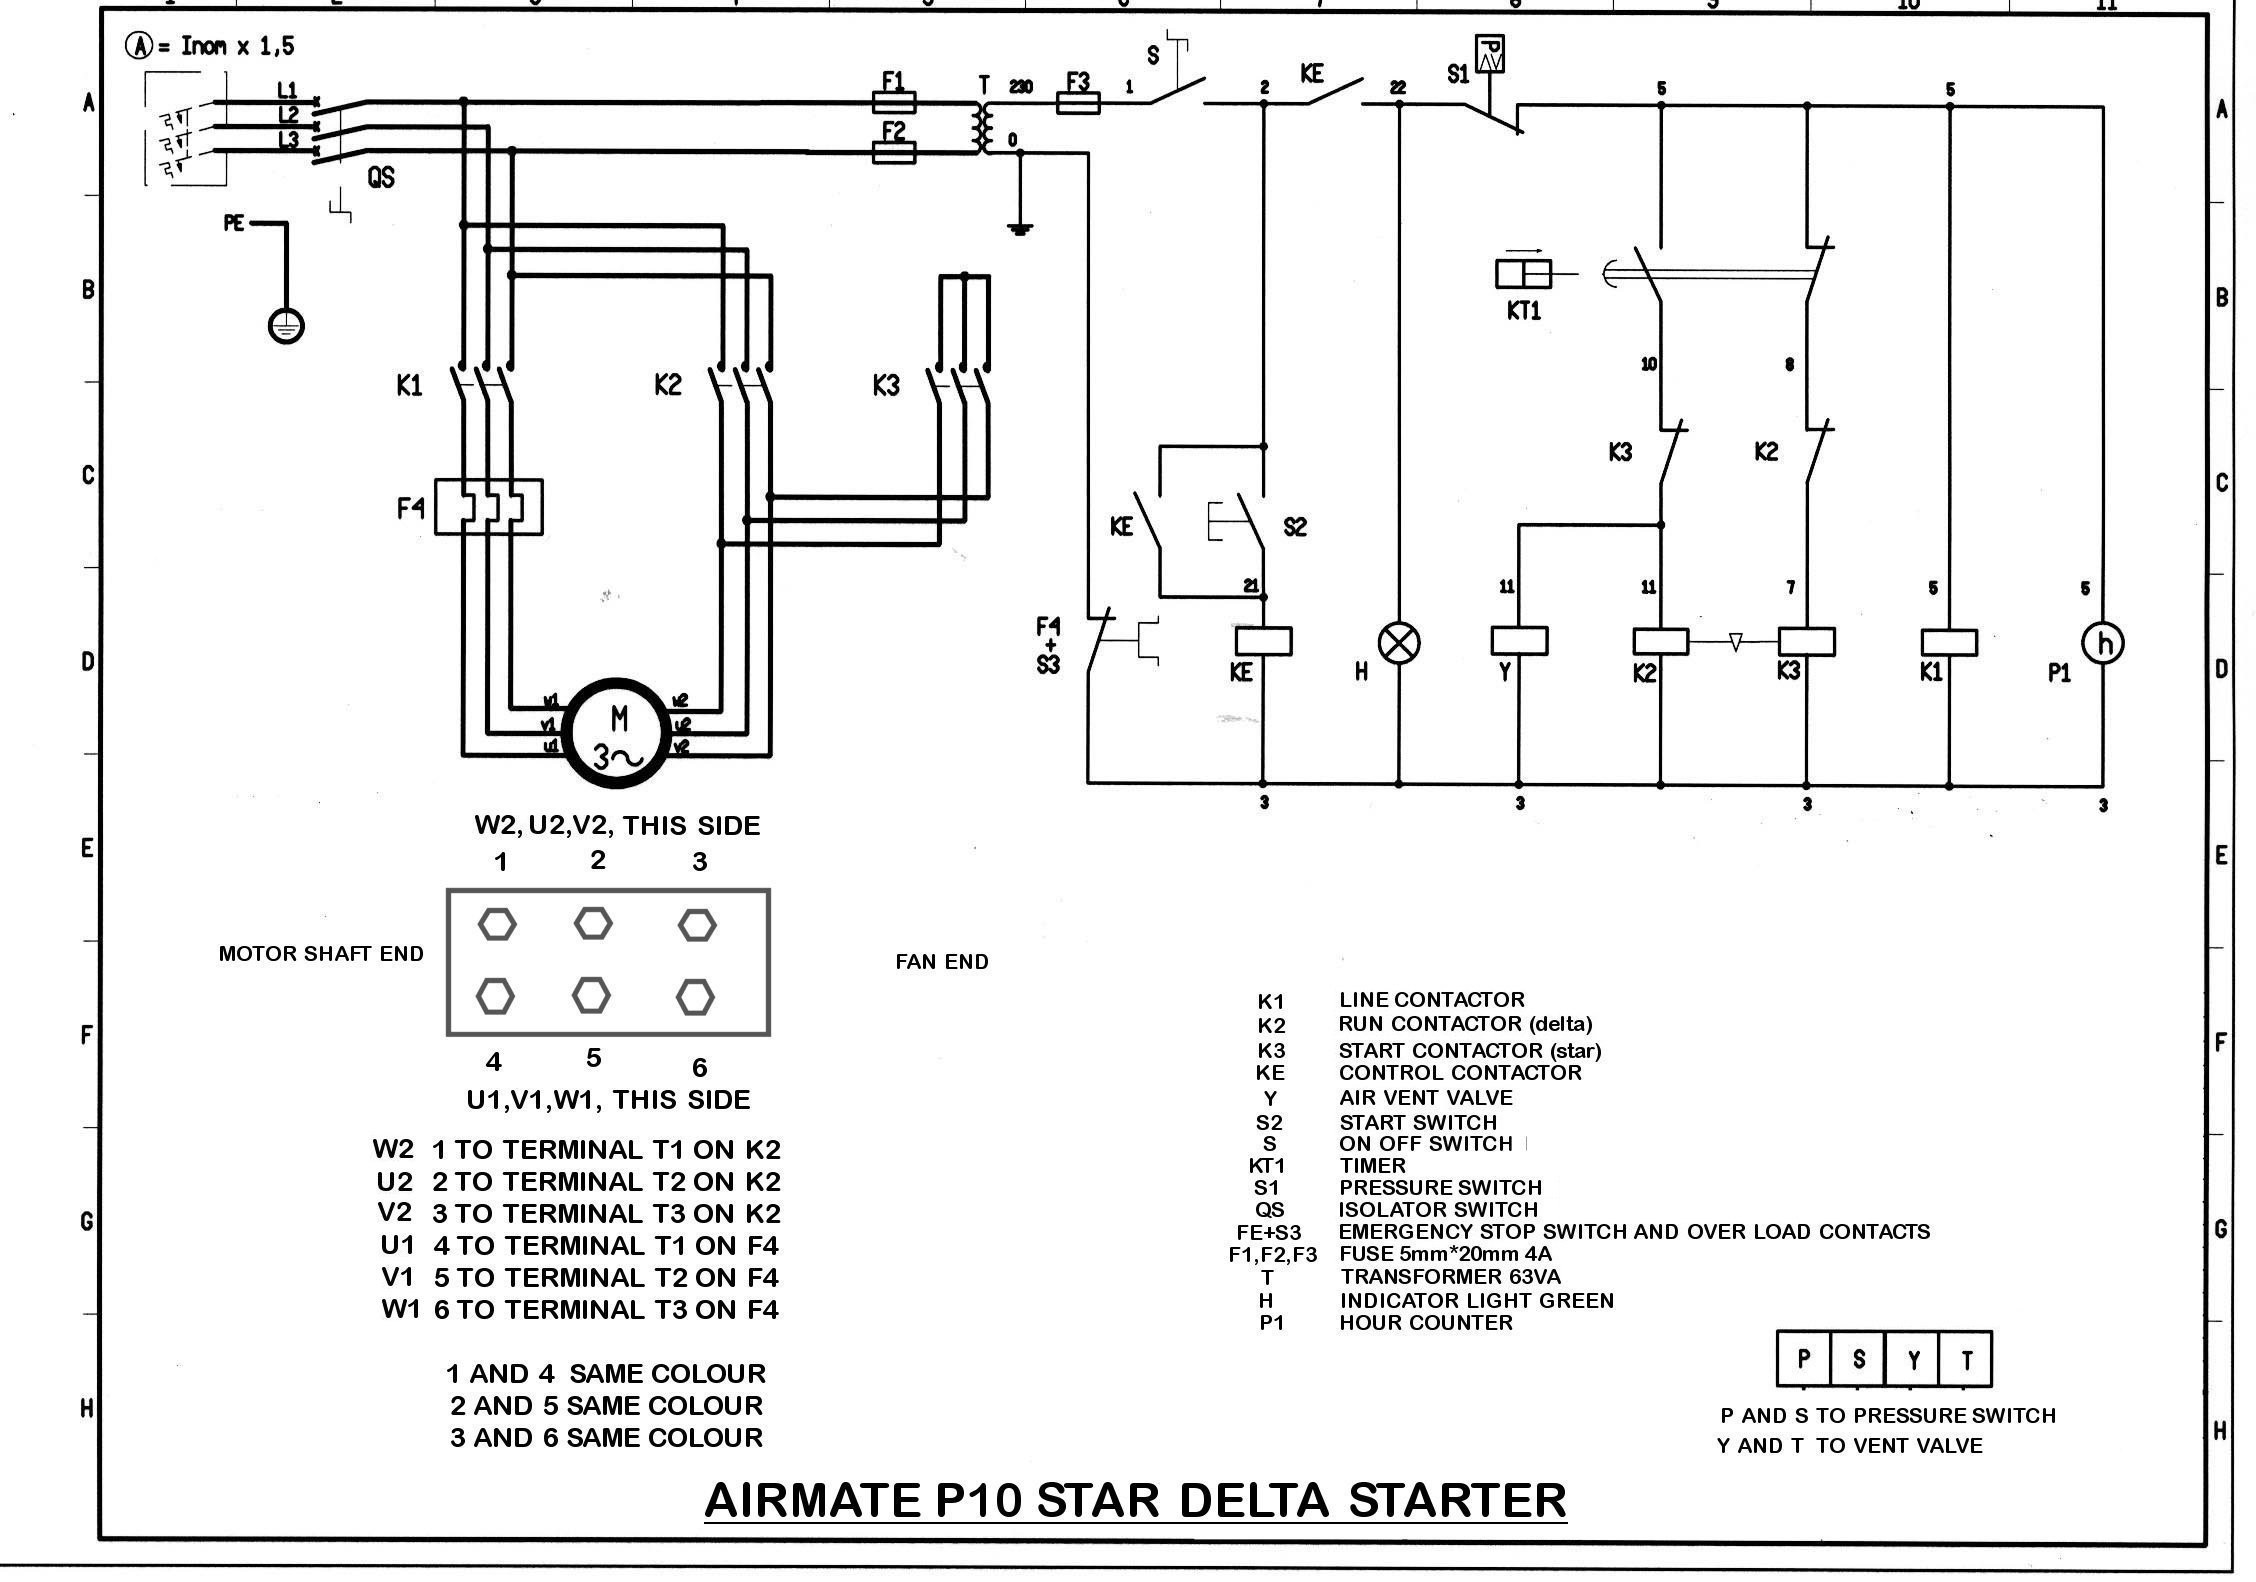 ingersoll rand air compressor circuit diagram